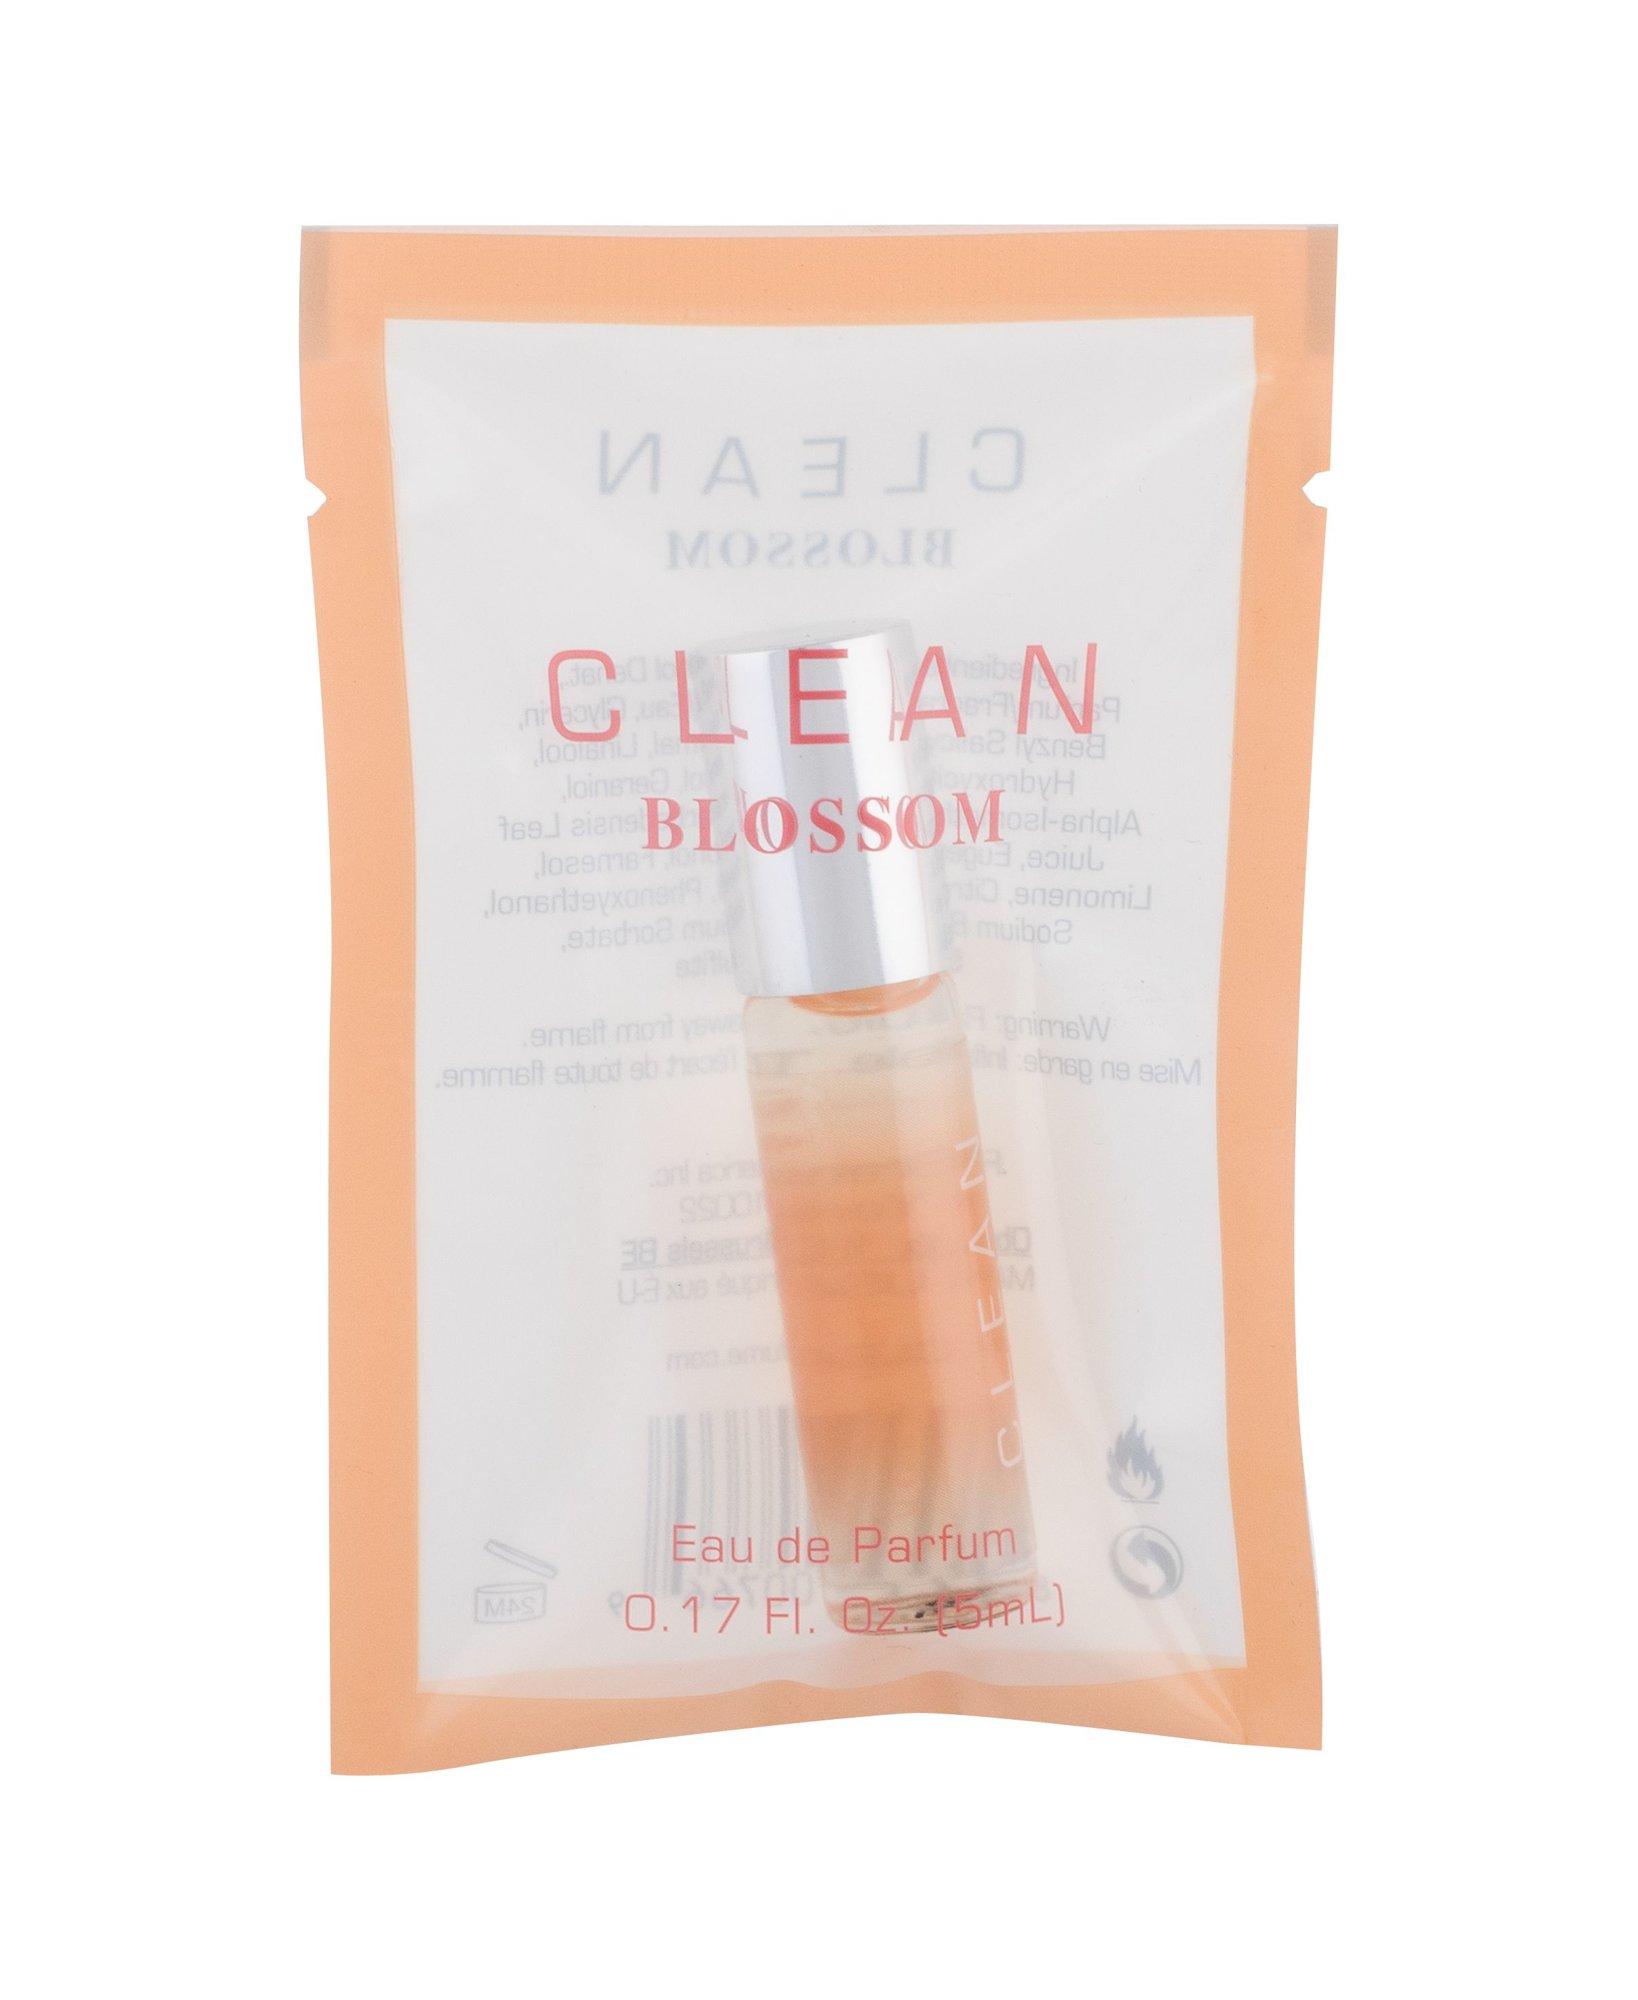 Clean Blossom Eau de Parfum 5ml